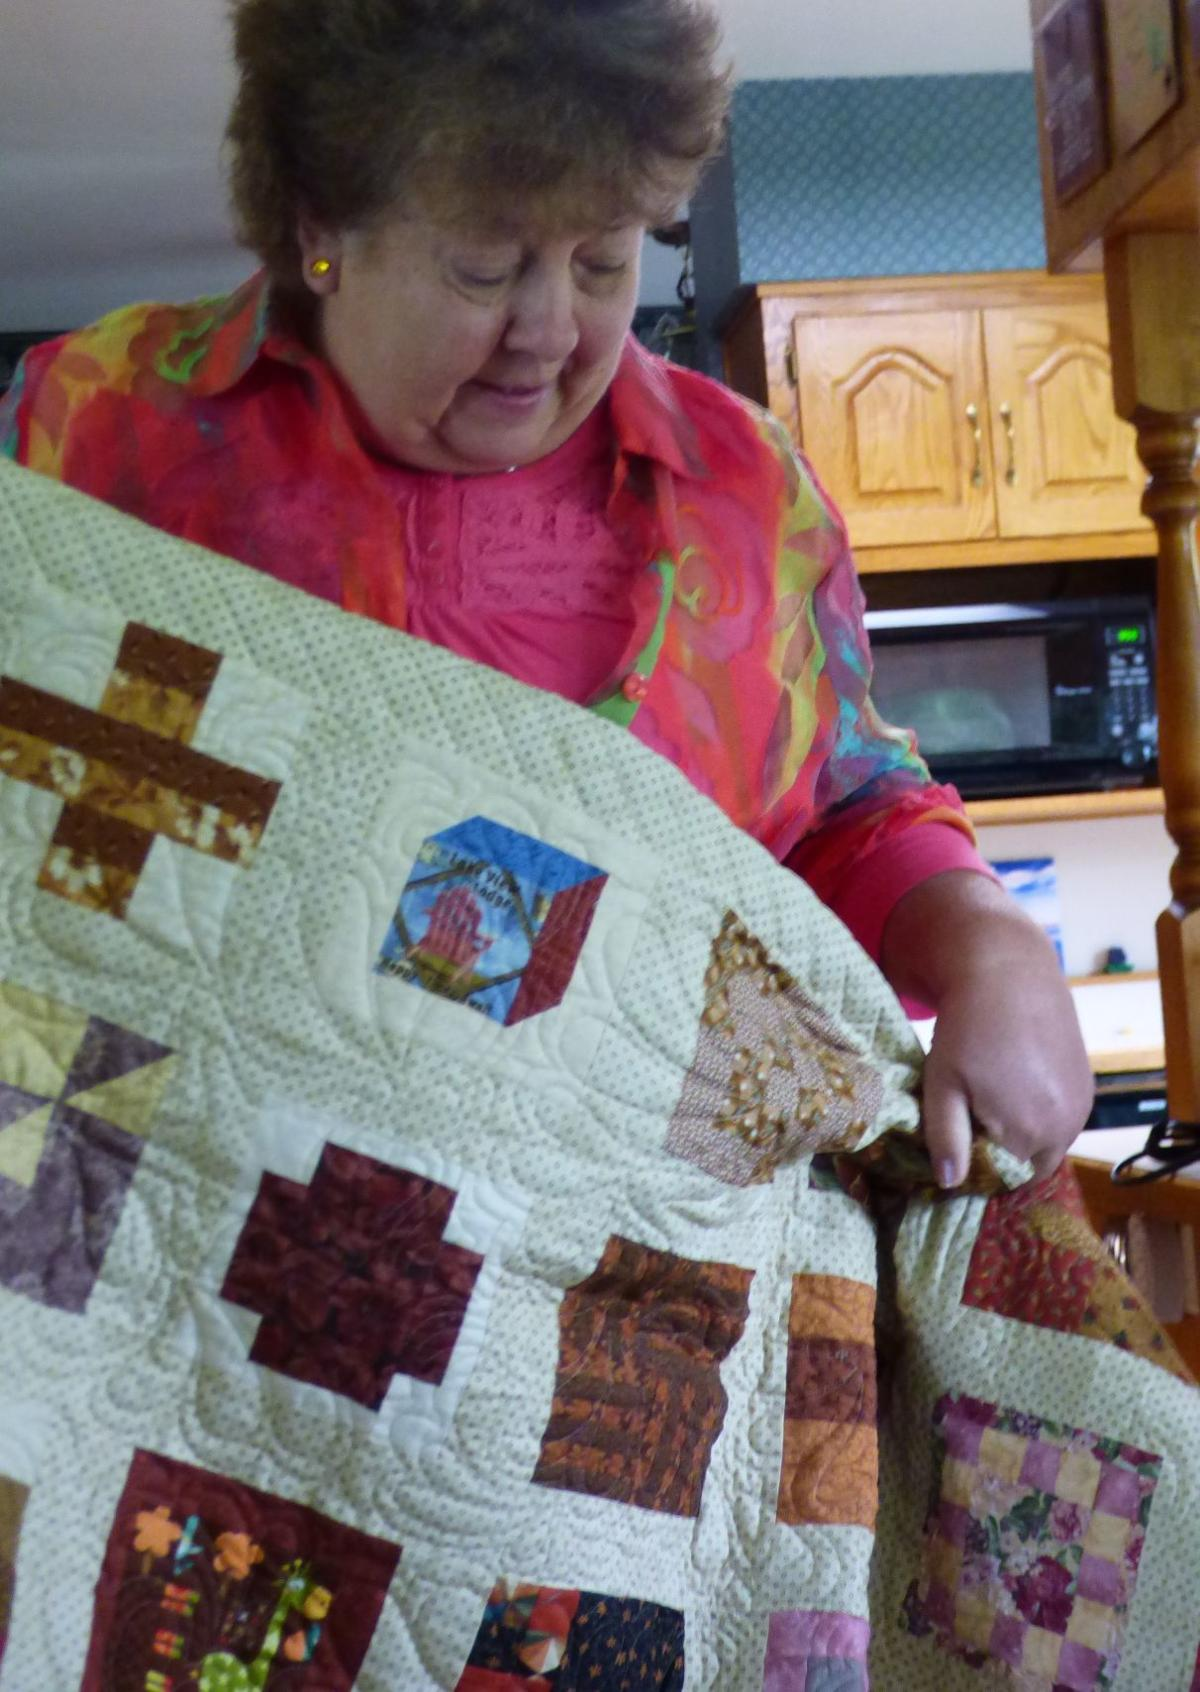 Evvie Hanson with quilt